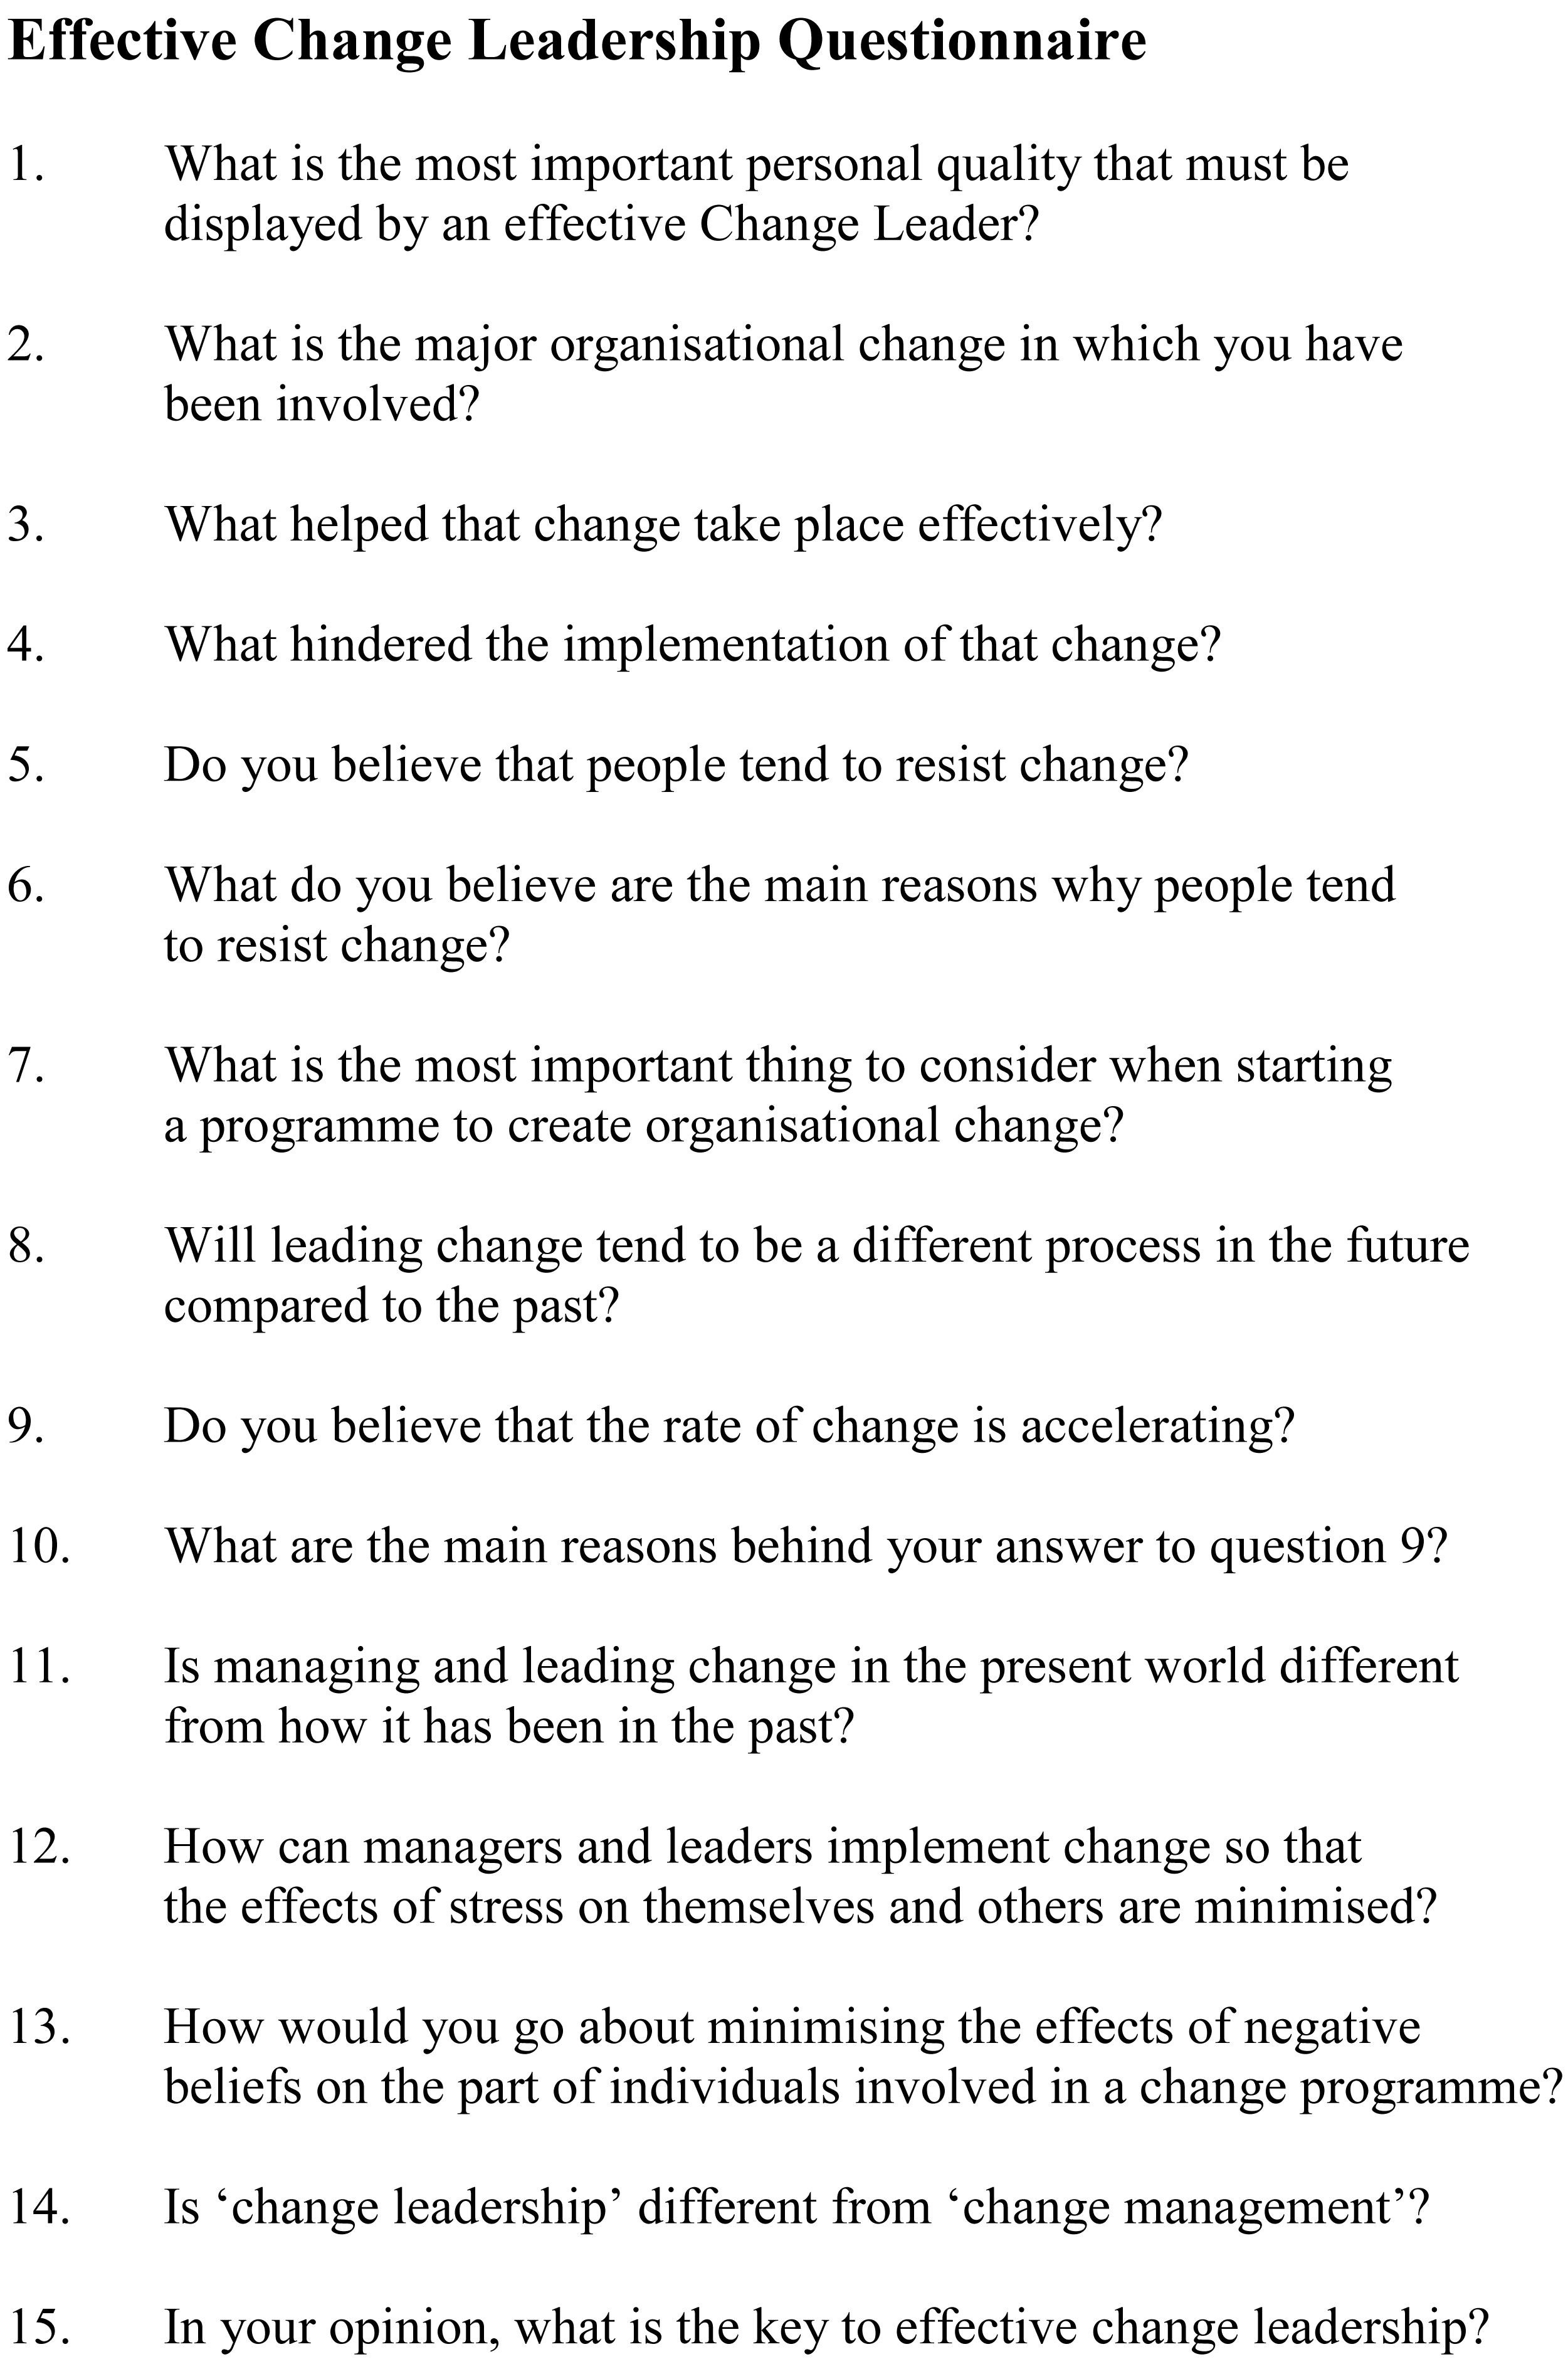 Effective Change Leadership Questionnaire Sample